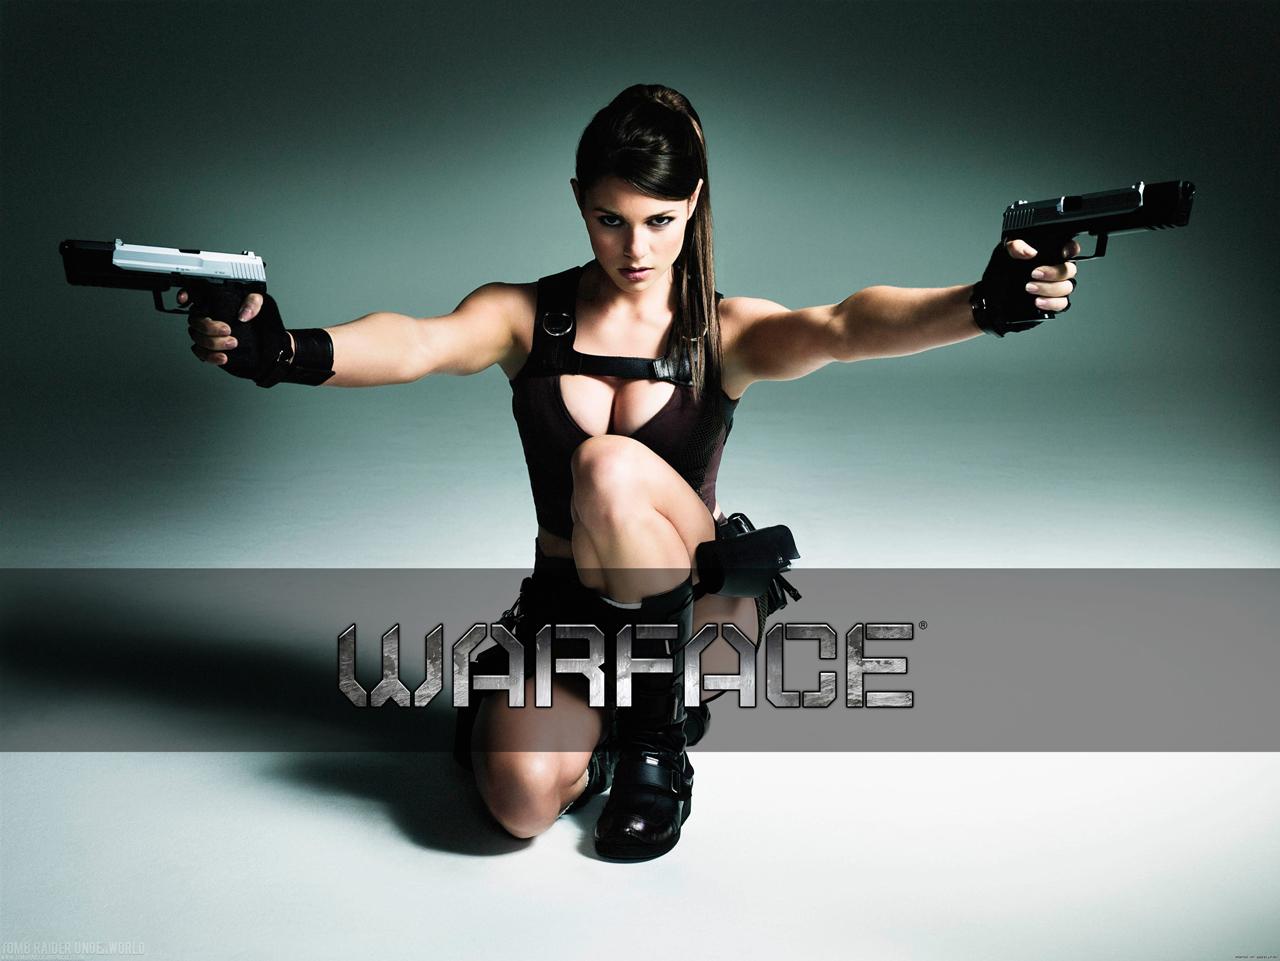 Жена проститутка фото имя в aim